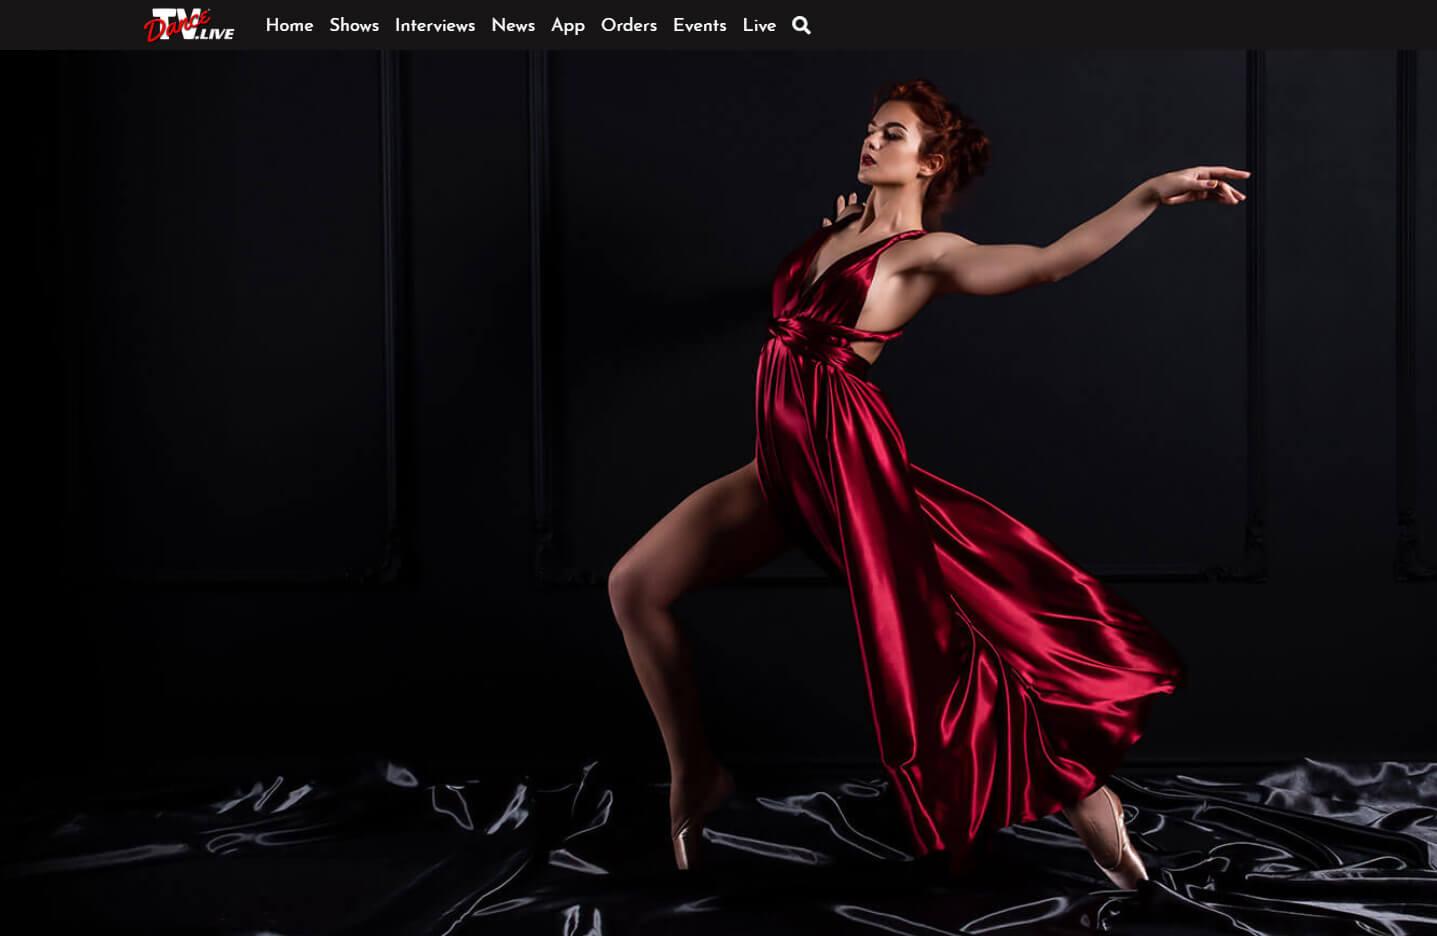 Veset powers a new live ballroom dancing channel TVDance.Live